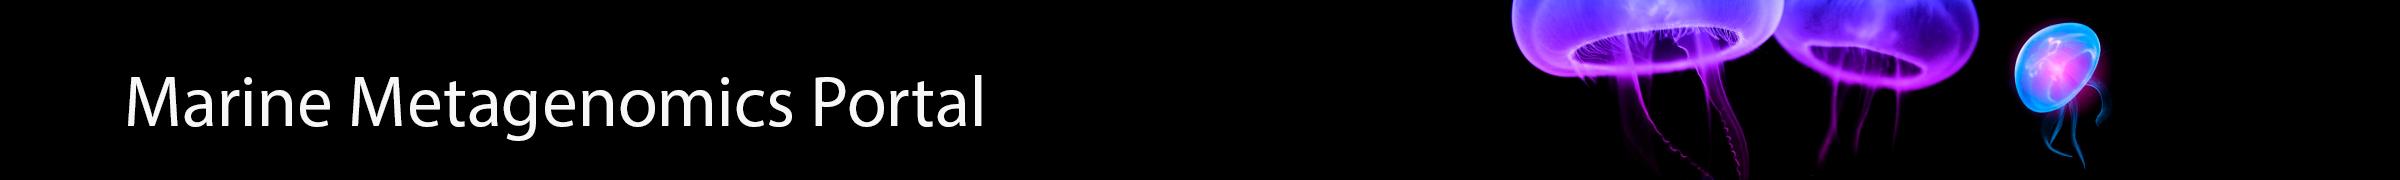 Marine Metagenomics Portal